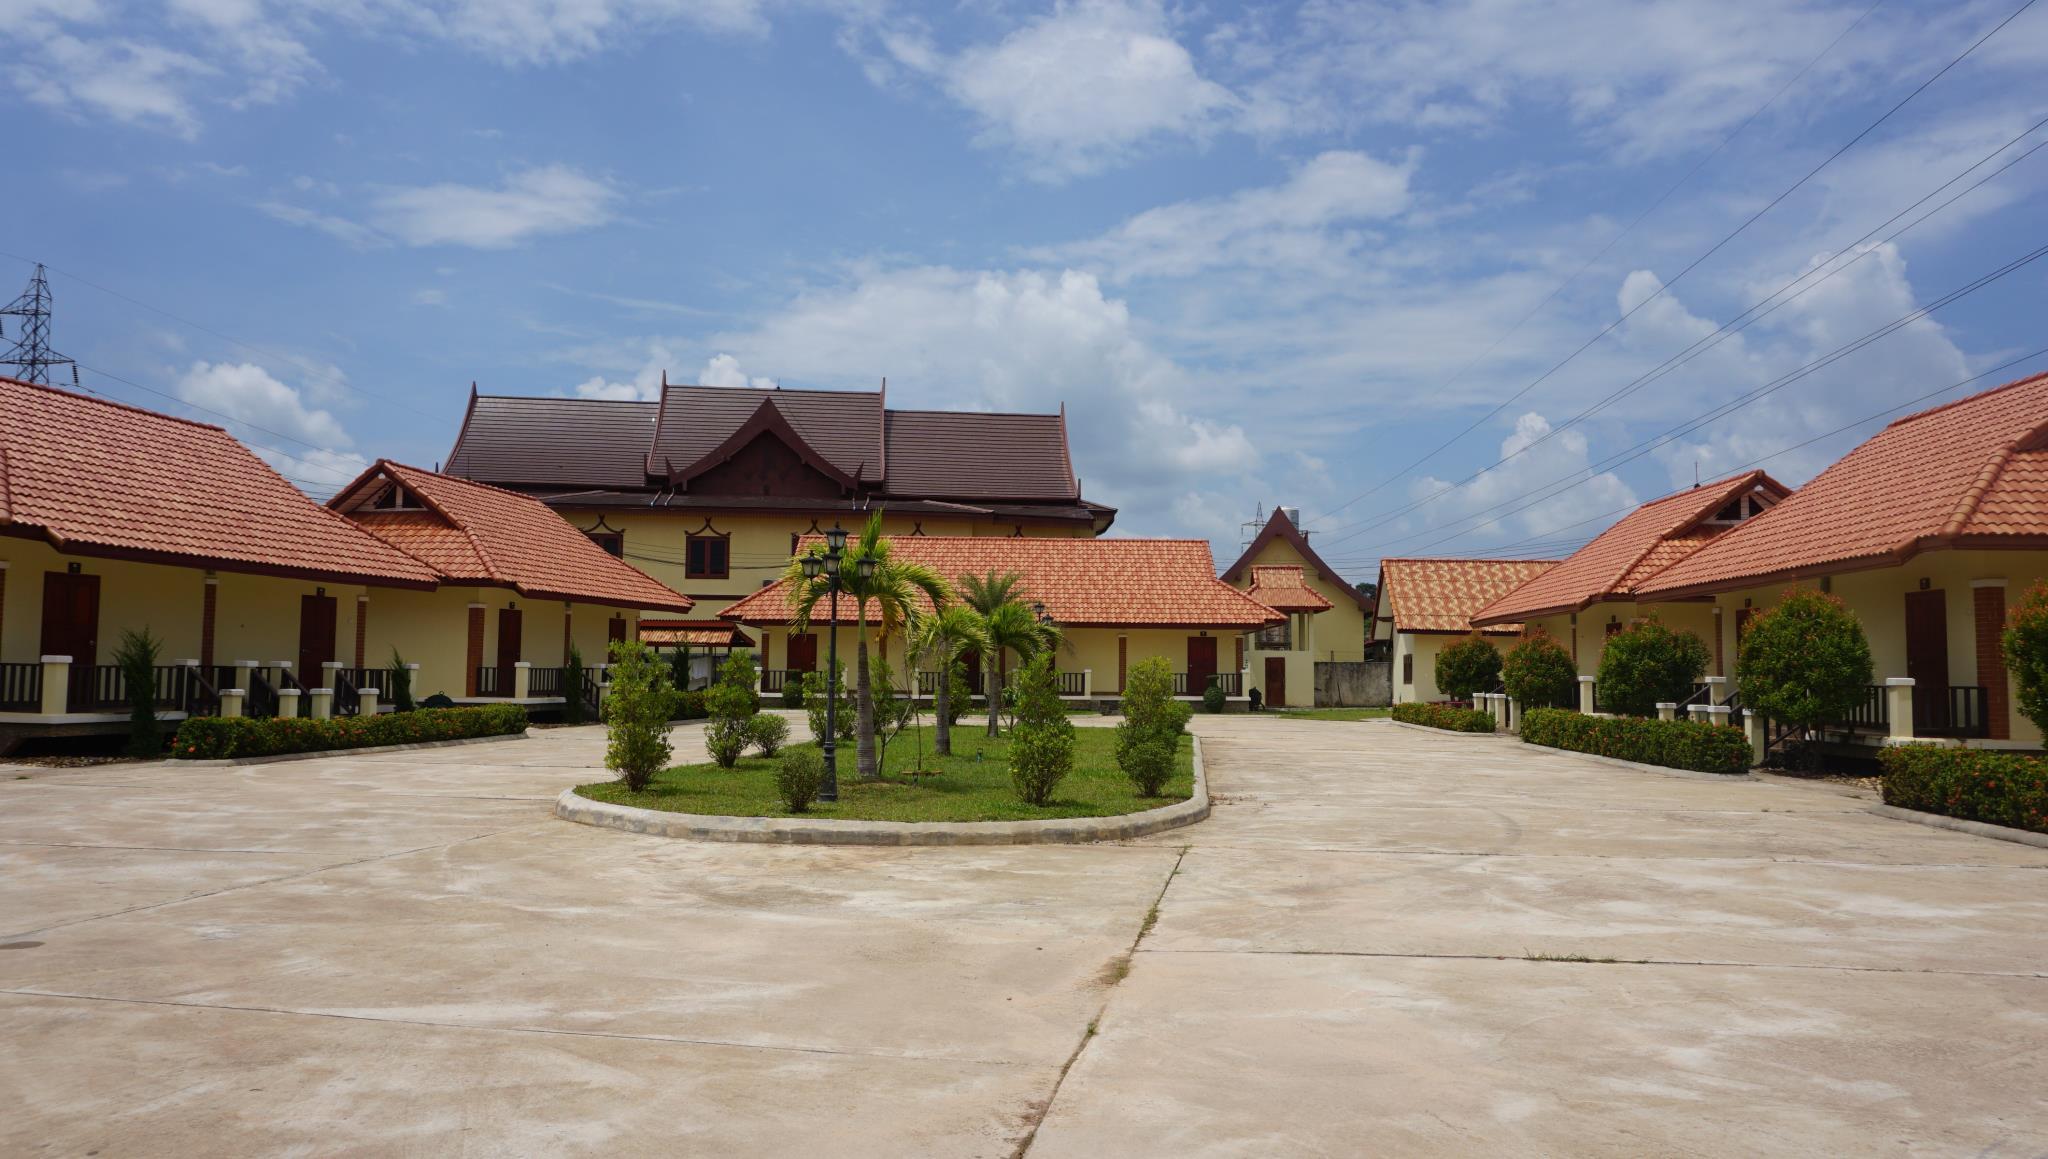 Sankhampak Guesthouse, Phonhong